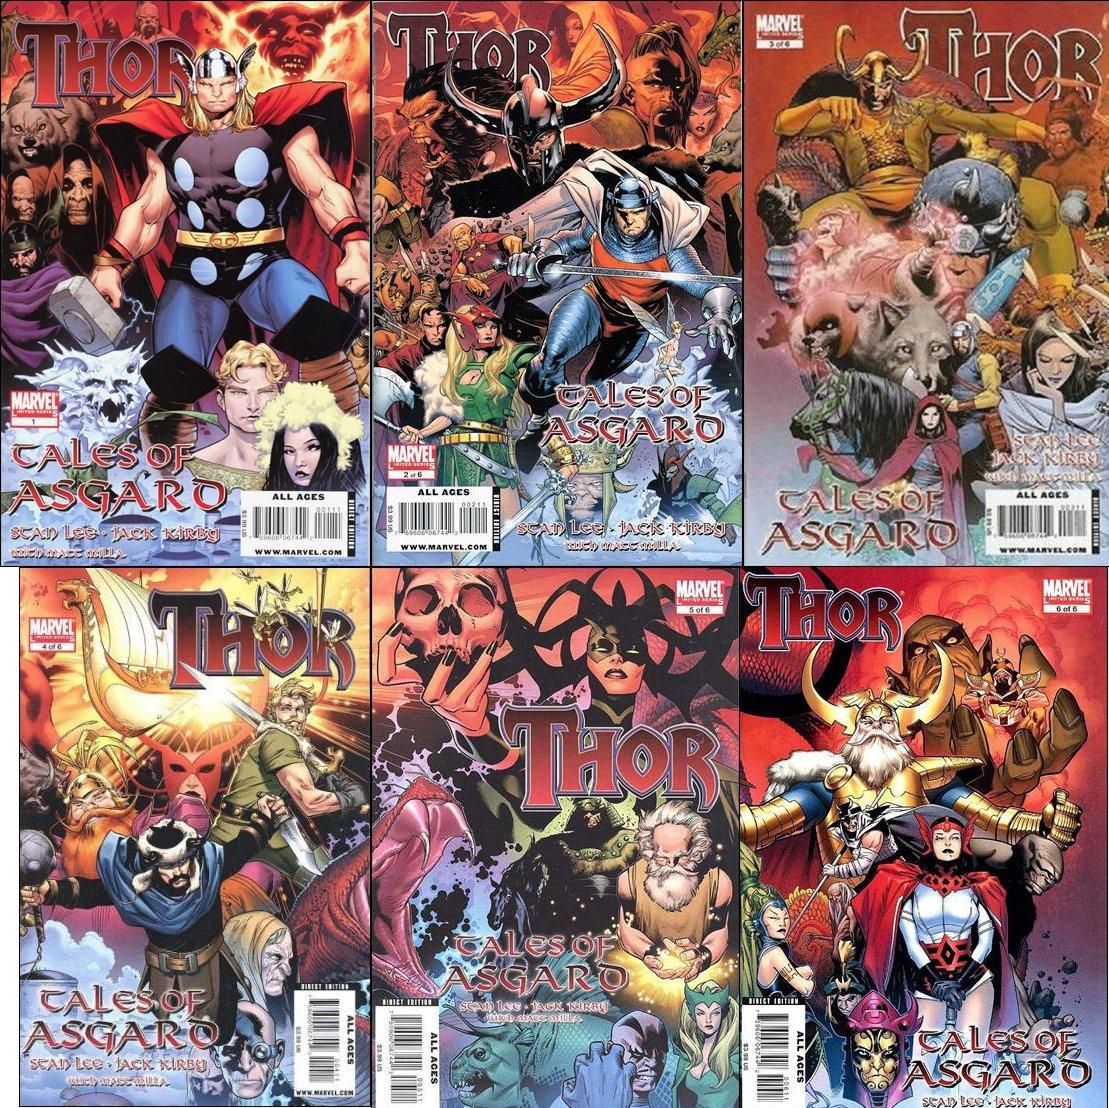 Thor Tales of Asgard Complete Set #1 2 3 4 5 6 [2009] VF/NM Marvel Comics